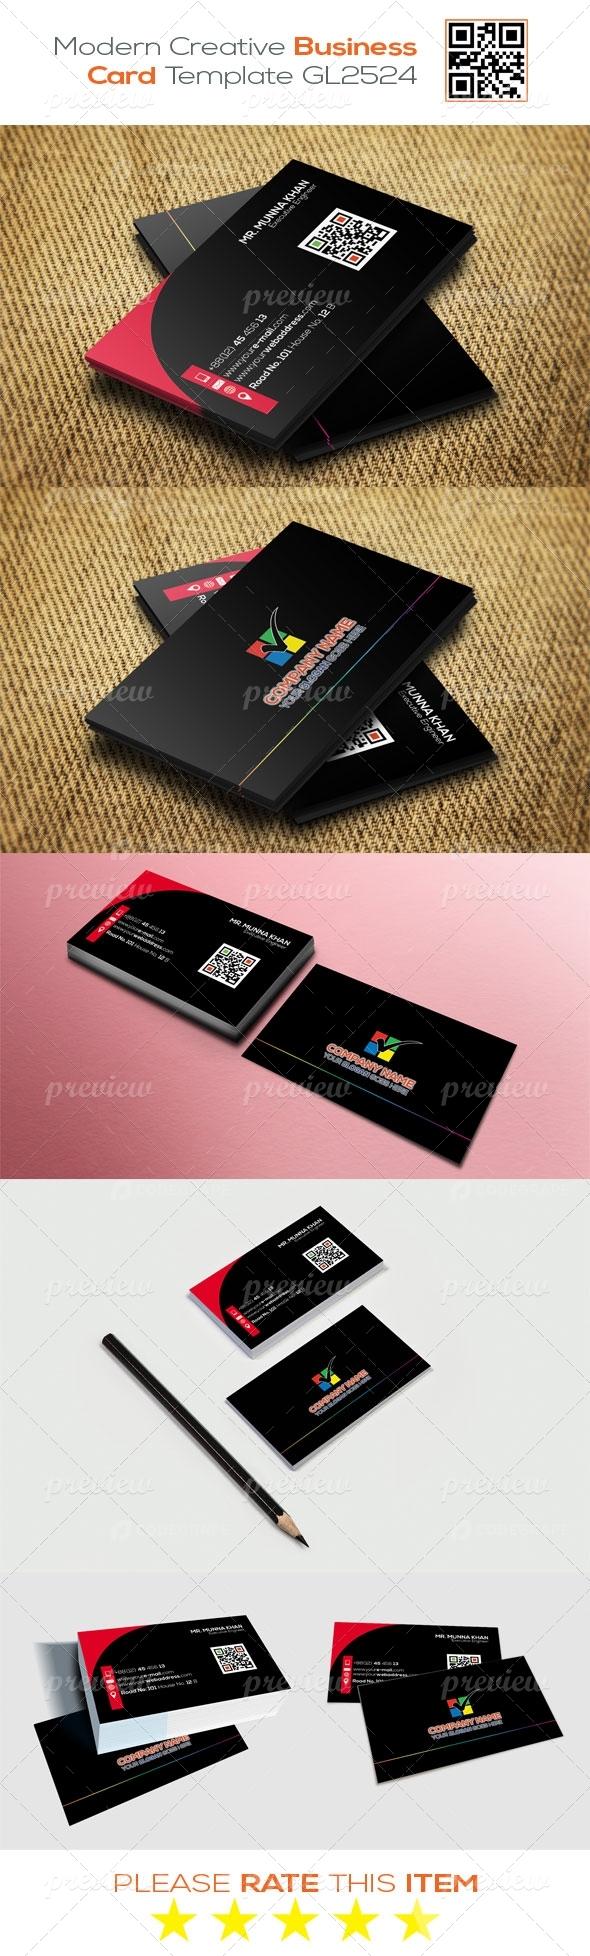 Modern Creative Business Card Template GL2524